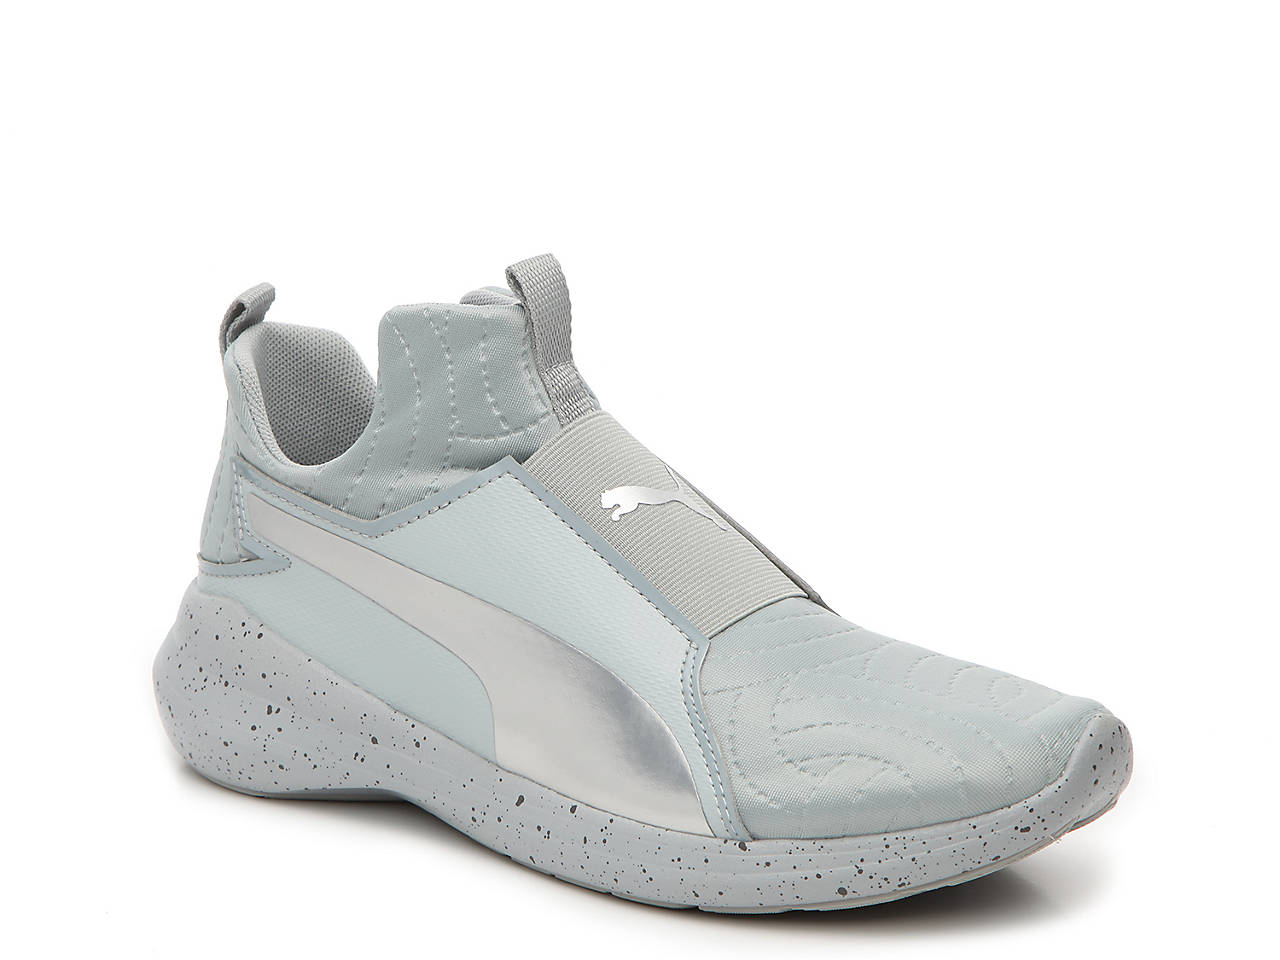 f501293d65ad Puma Rebel Mid Speckle Slip-On Training Shoe - Women s Women s Shoes ...